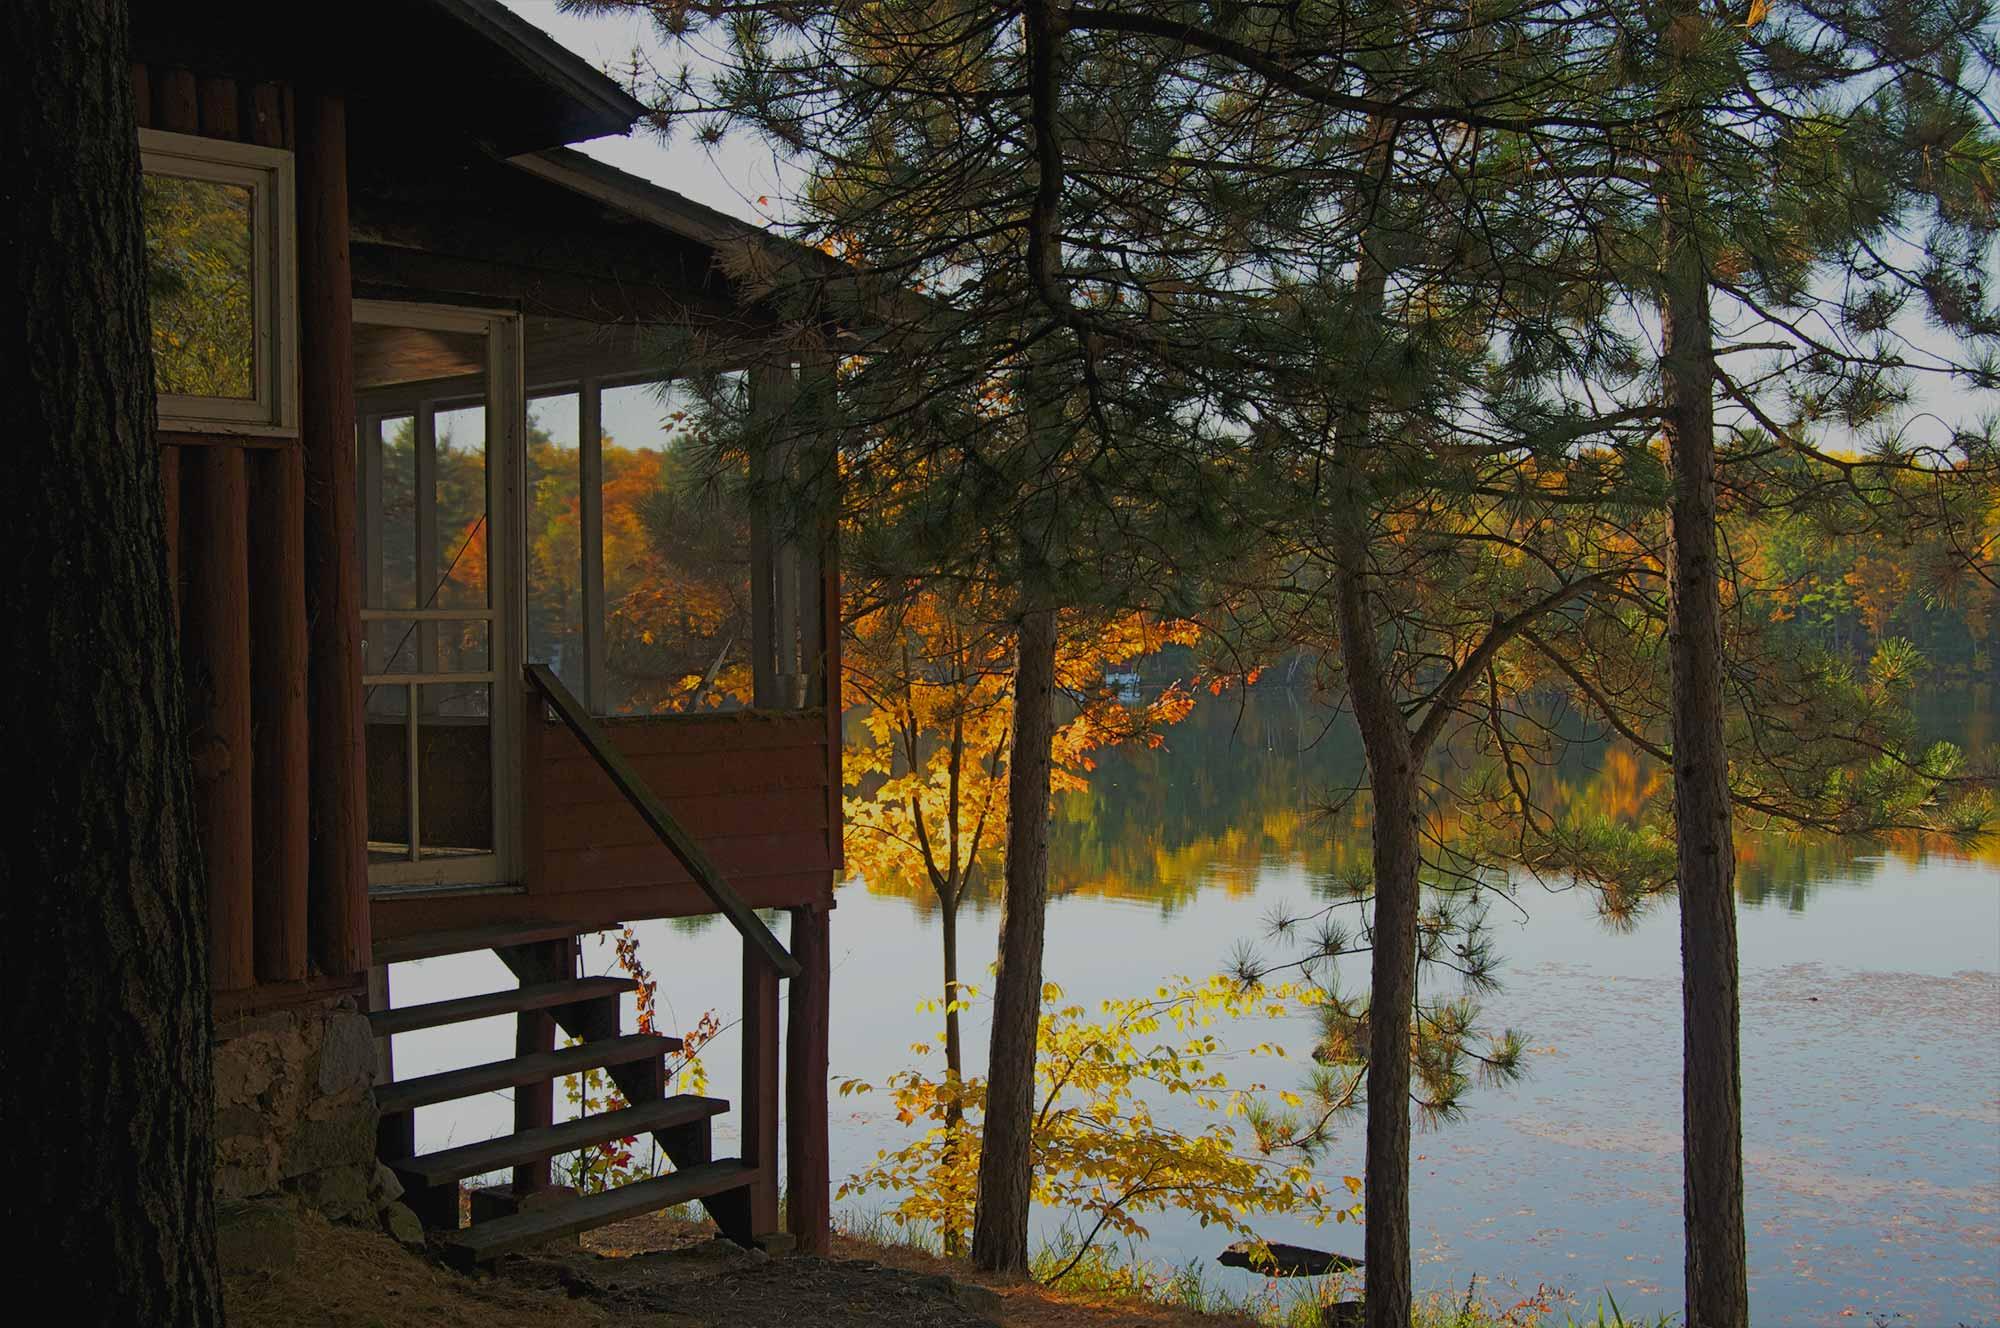 Minnesota and wisconsin lake cabin loans lake cabins and for Minnesota lake cabin for sale